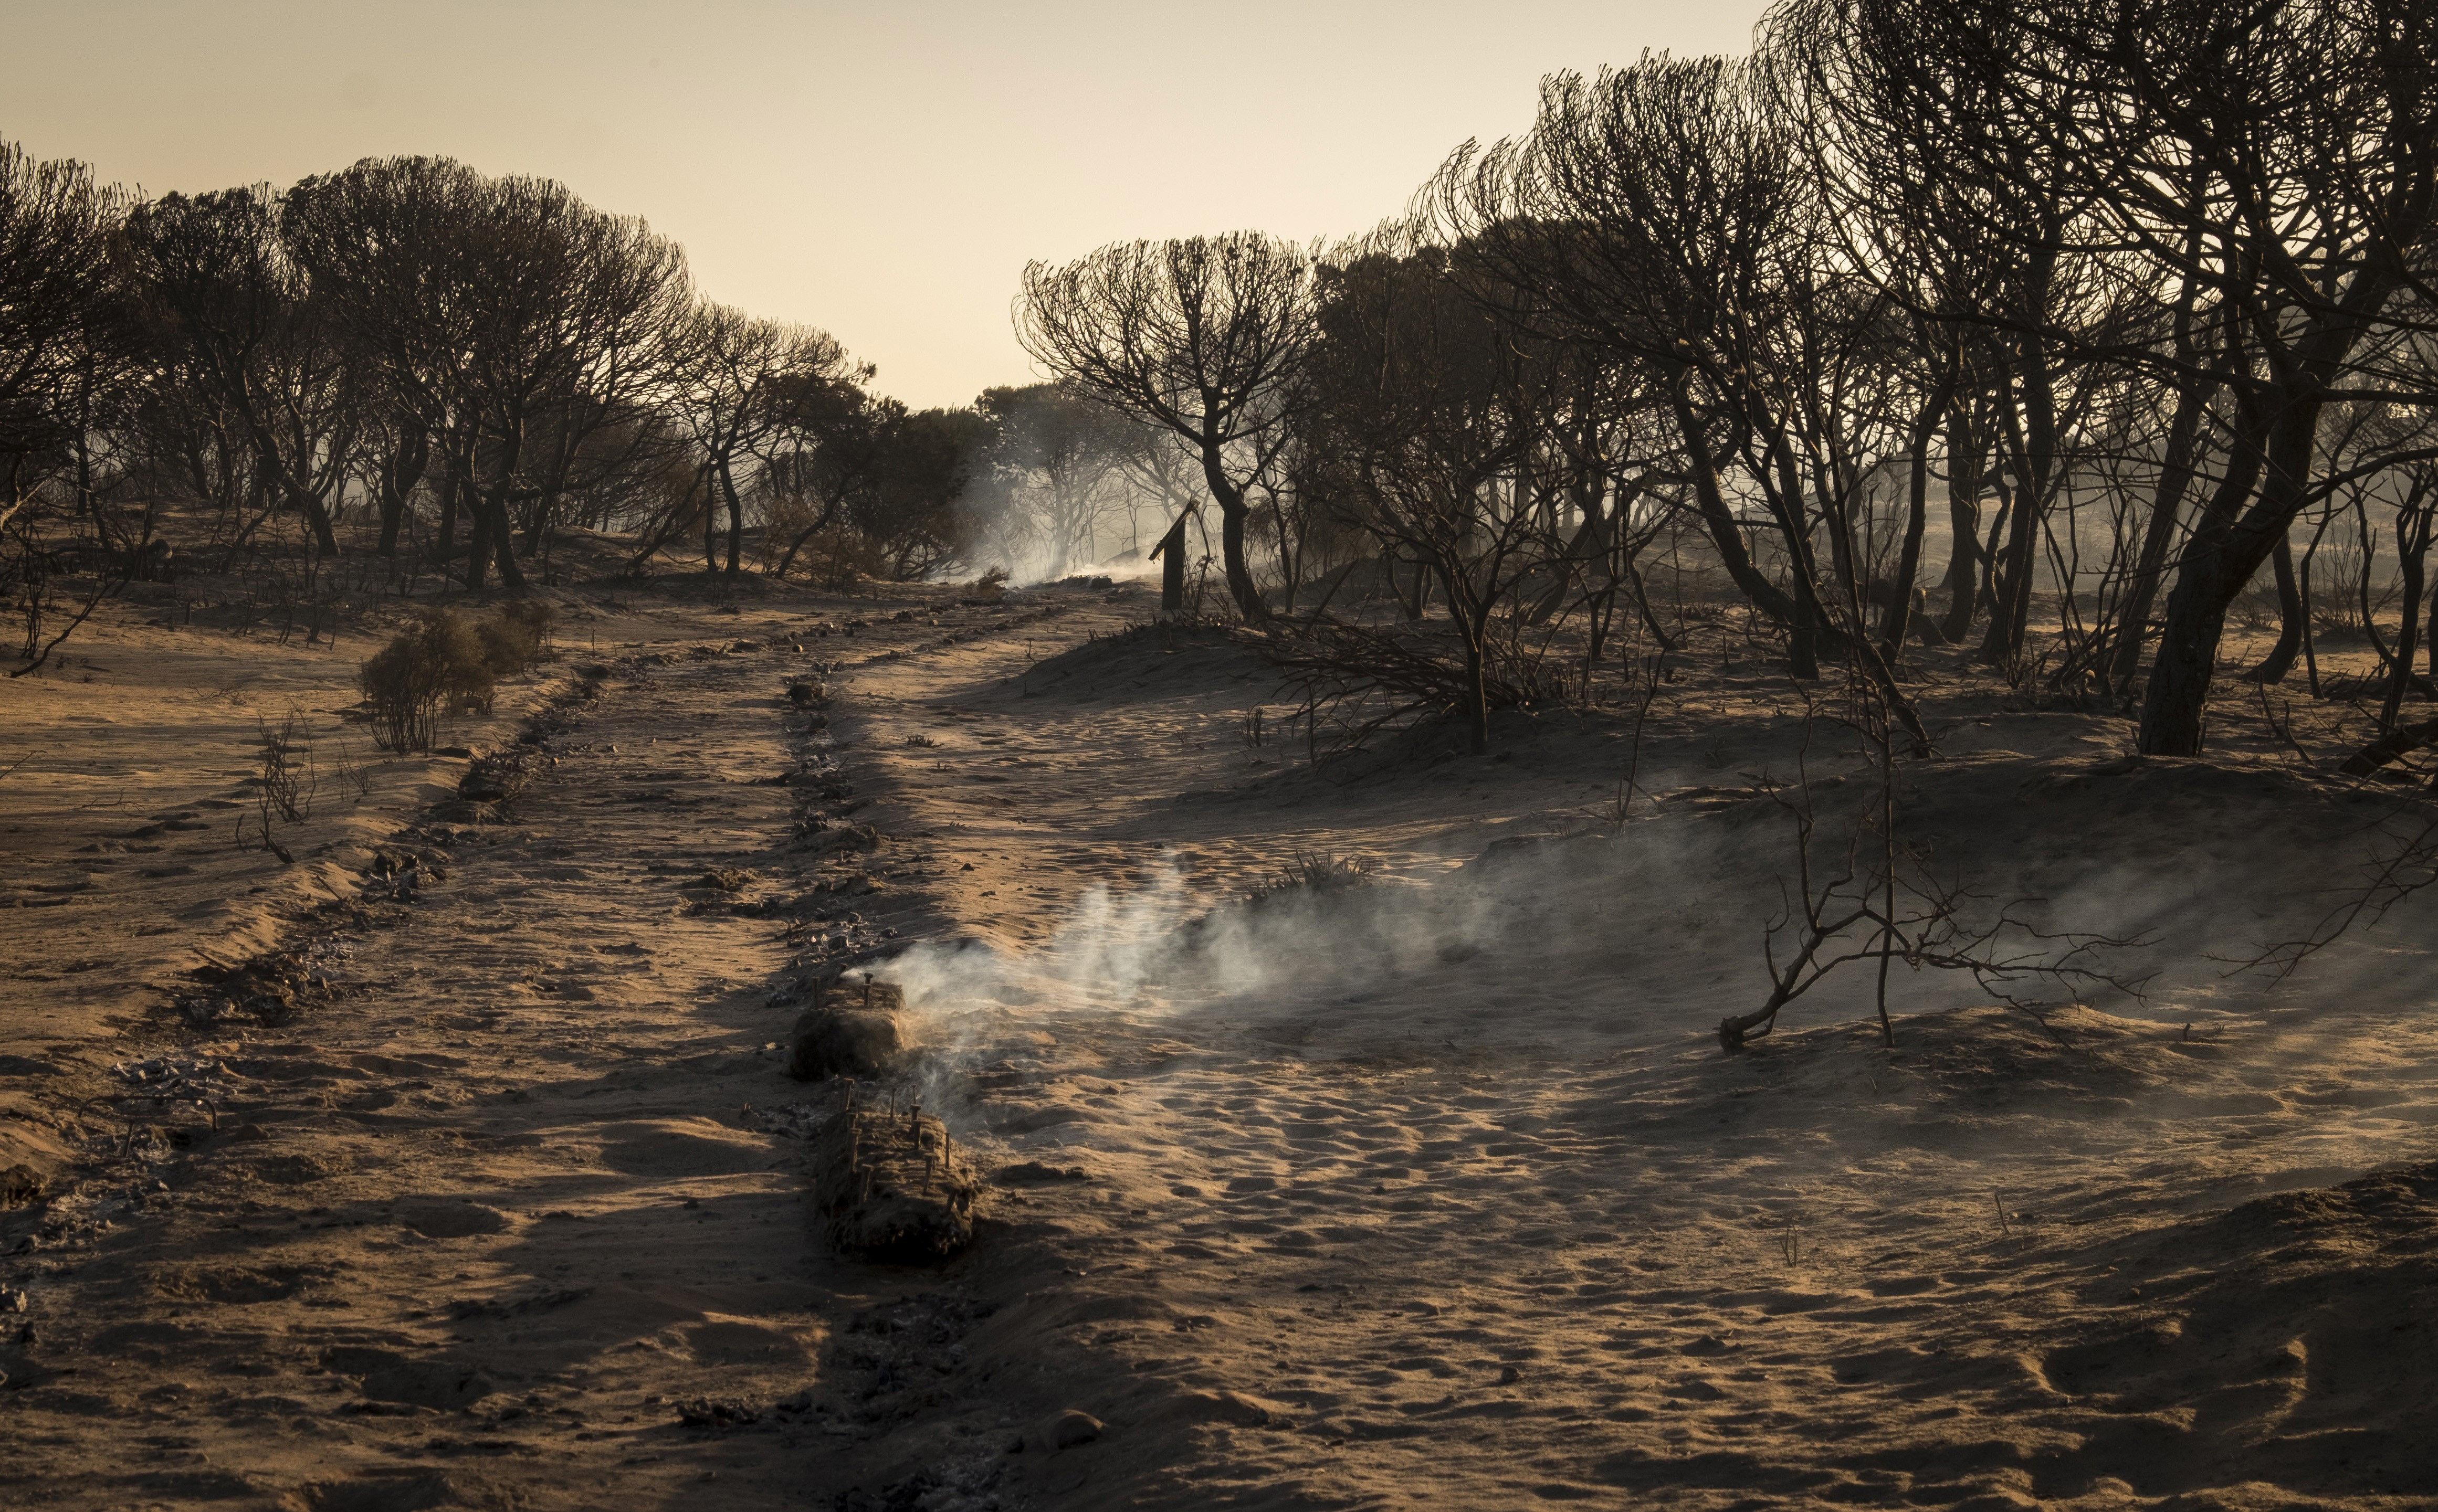 Imatge desoladora de l'incendi que crema a Andalusia des de dissabte. /JULIÁN PÉREZ